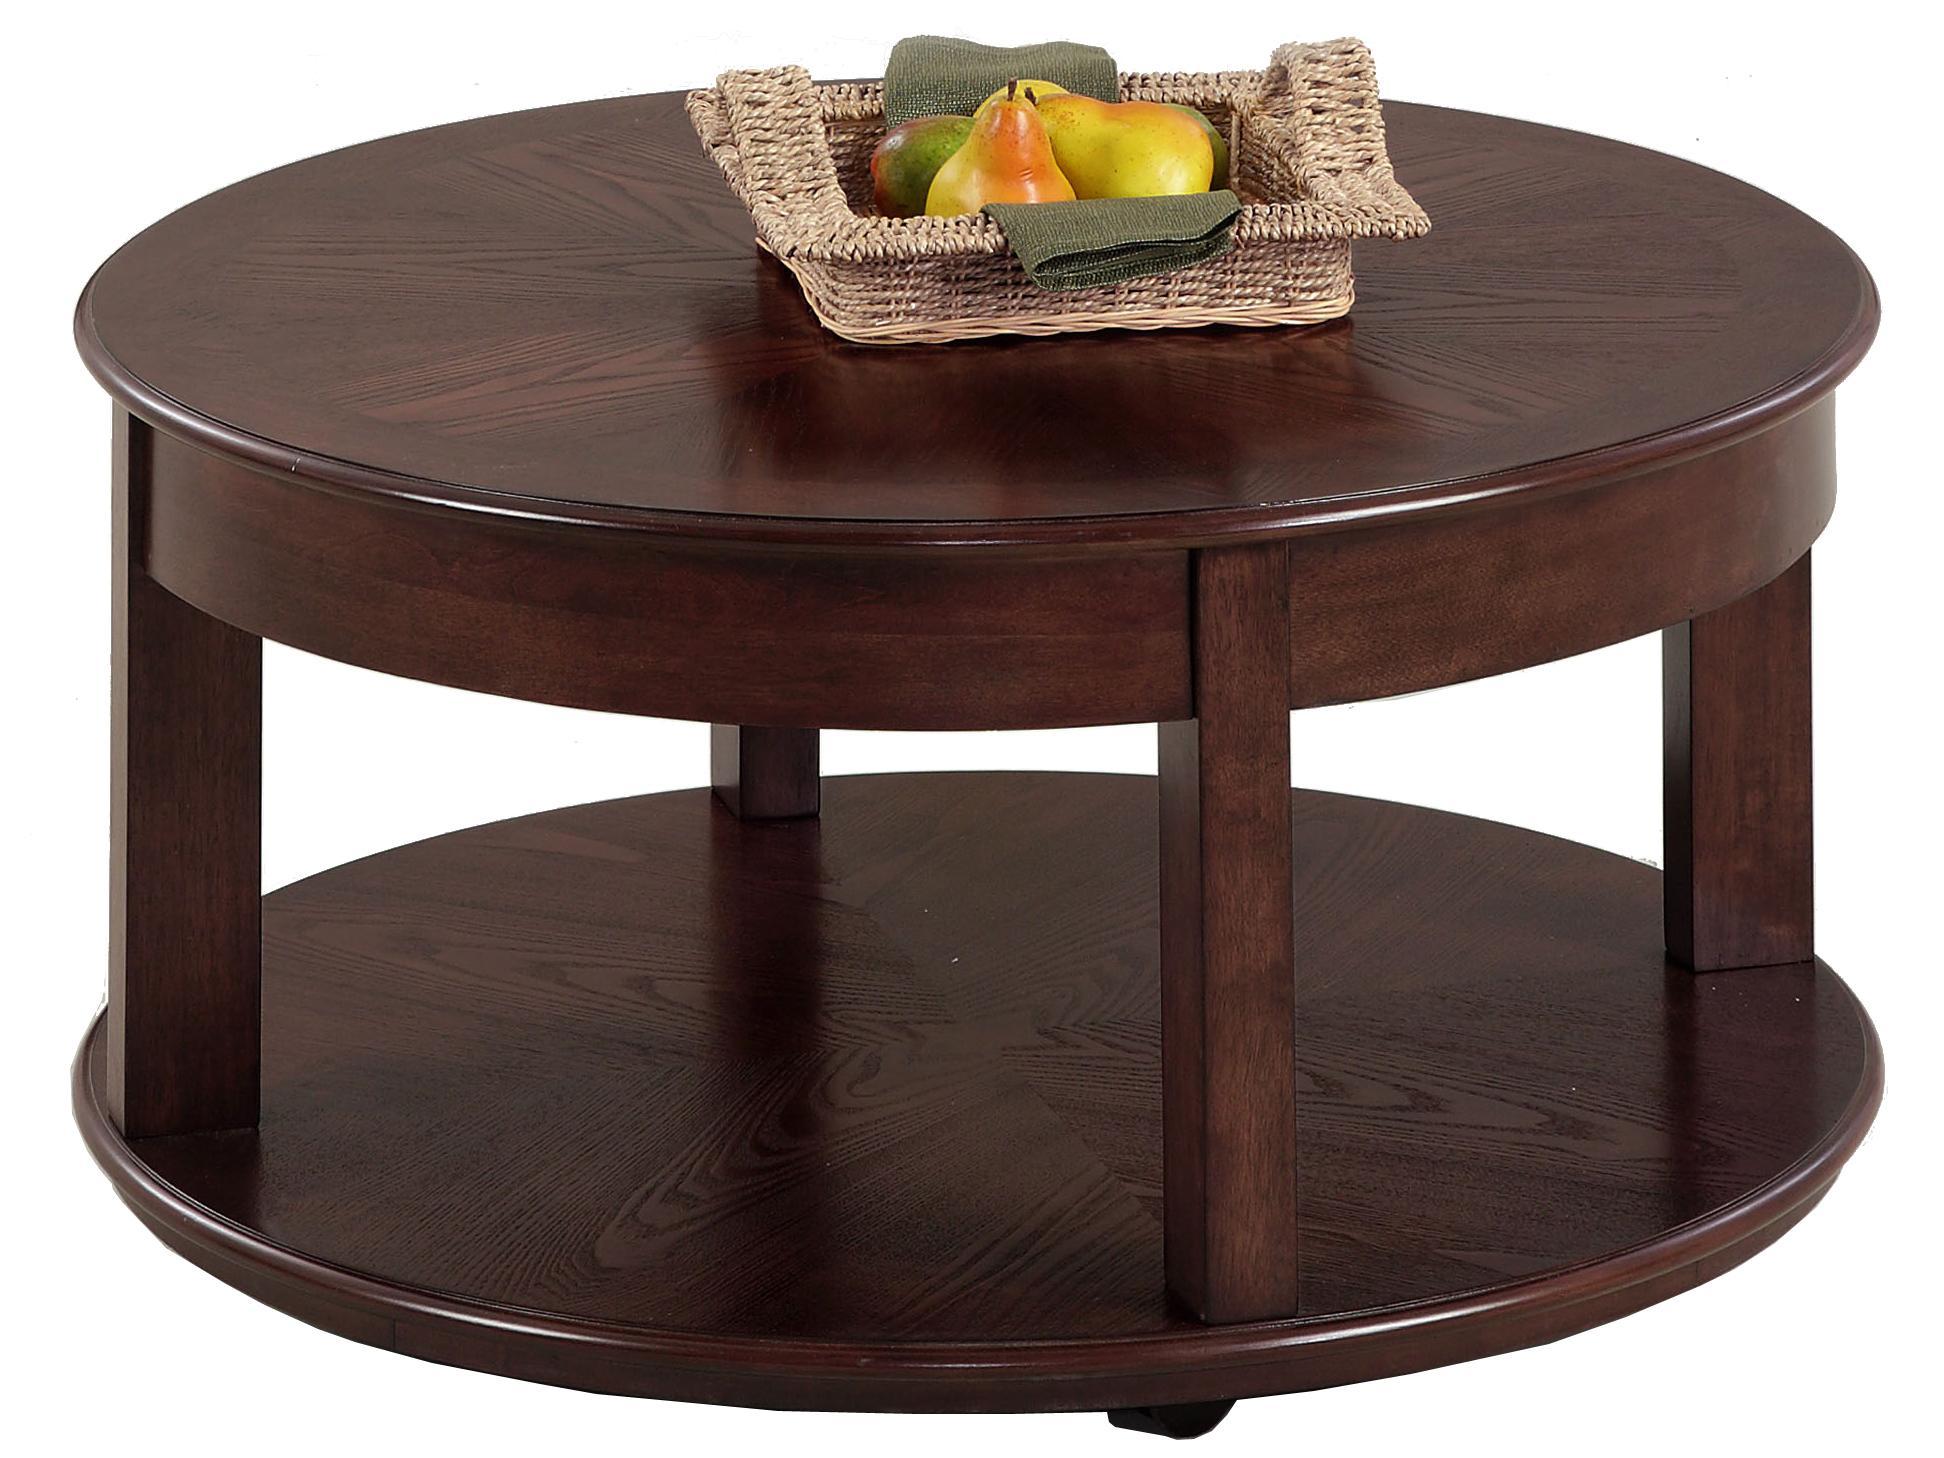 Sebring Castered Round Cocktail Table by Progressive Furniture at Carolina Direct